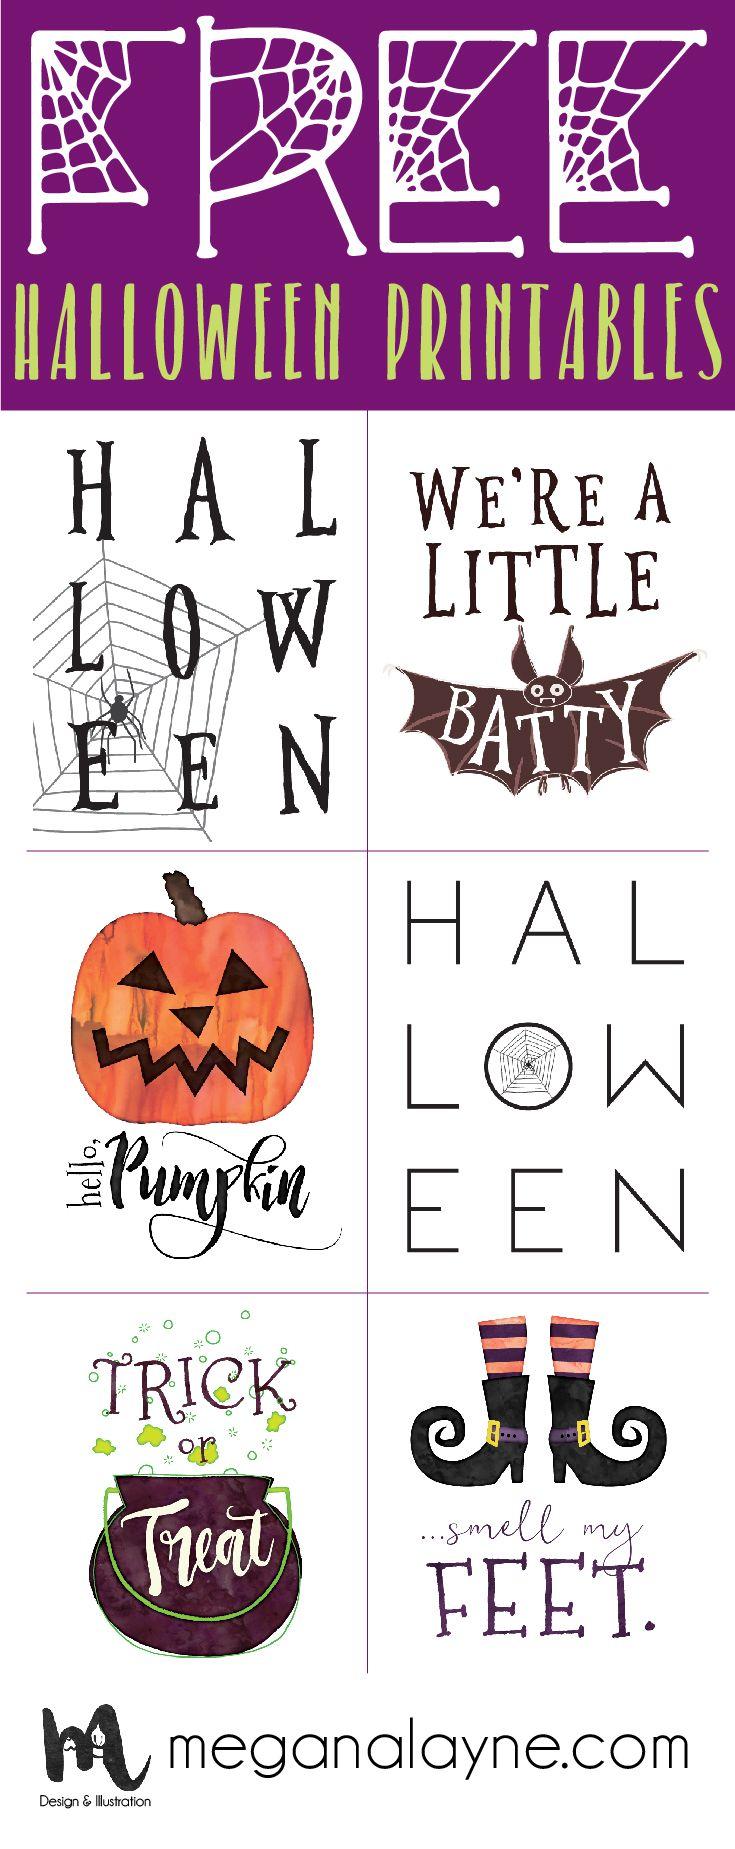 Free bundle of 8x10 Halloween Printables!